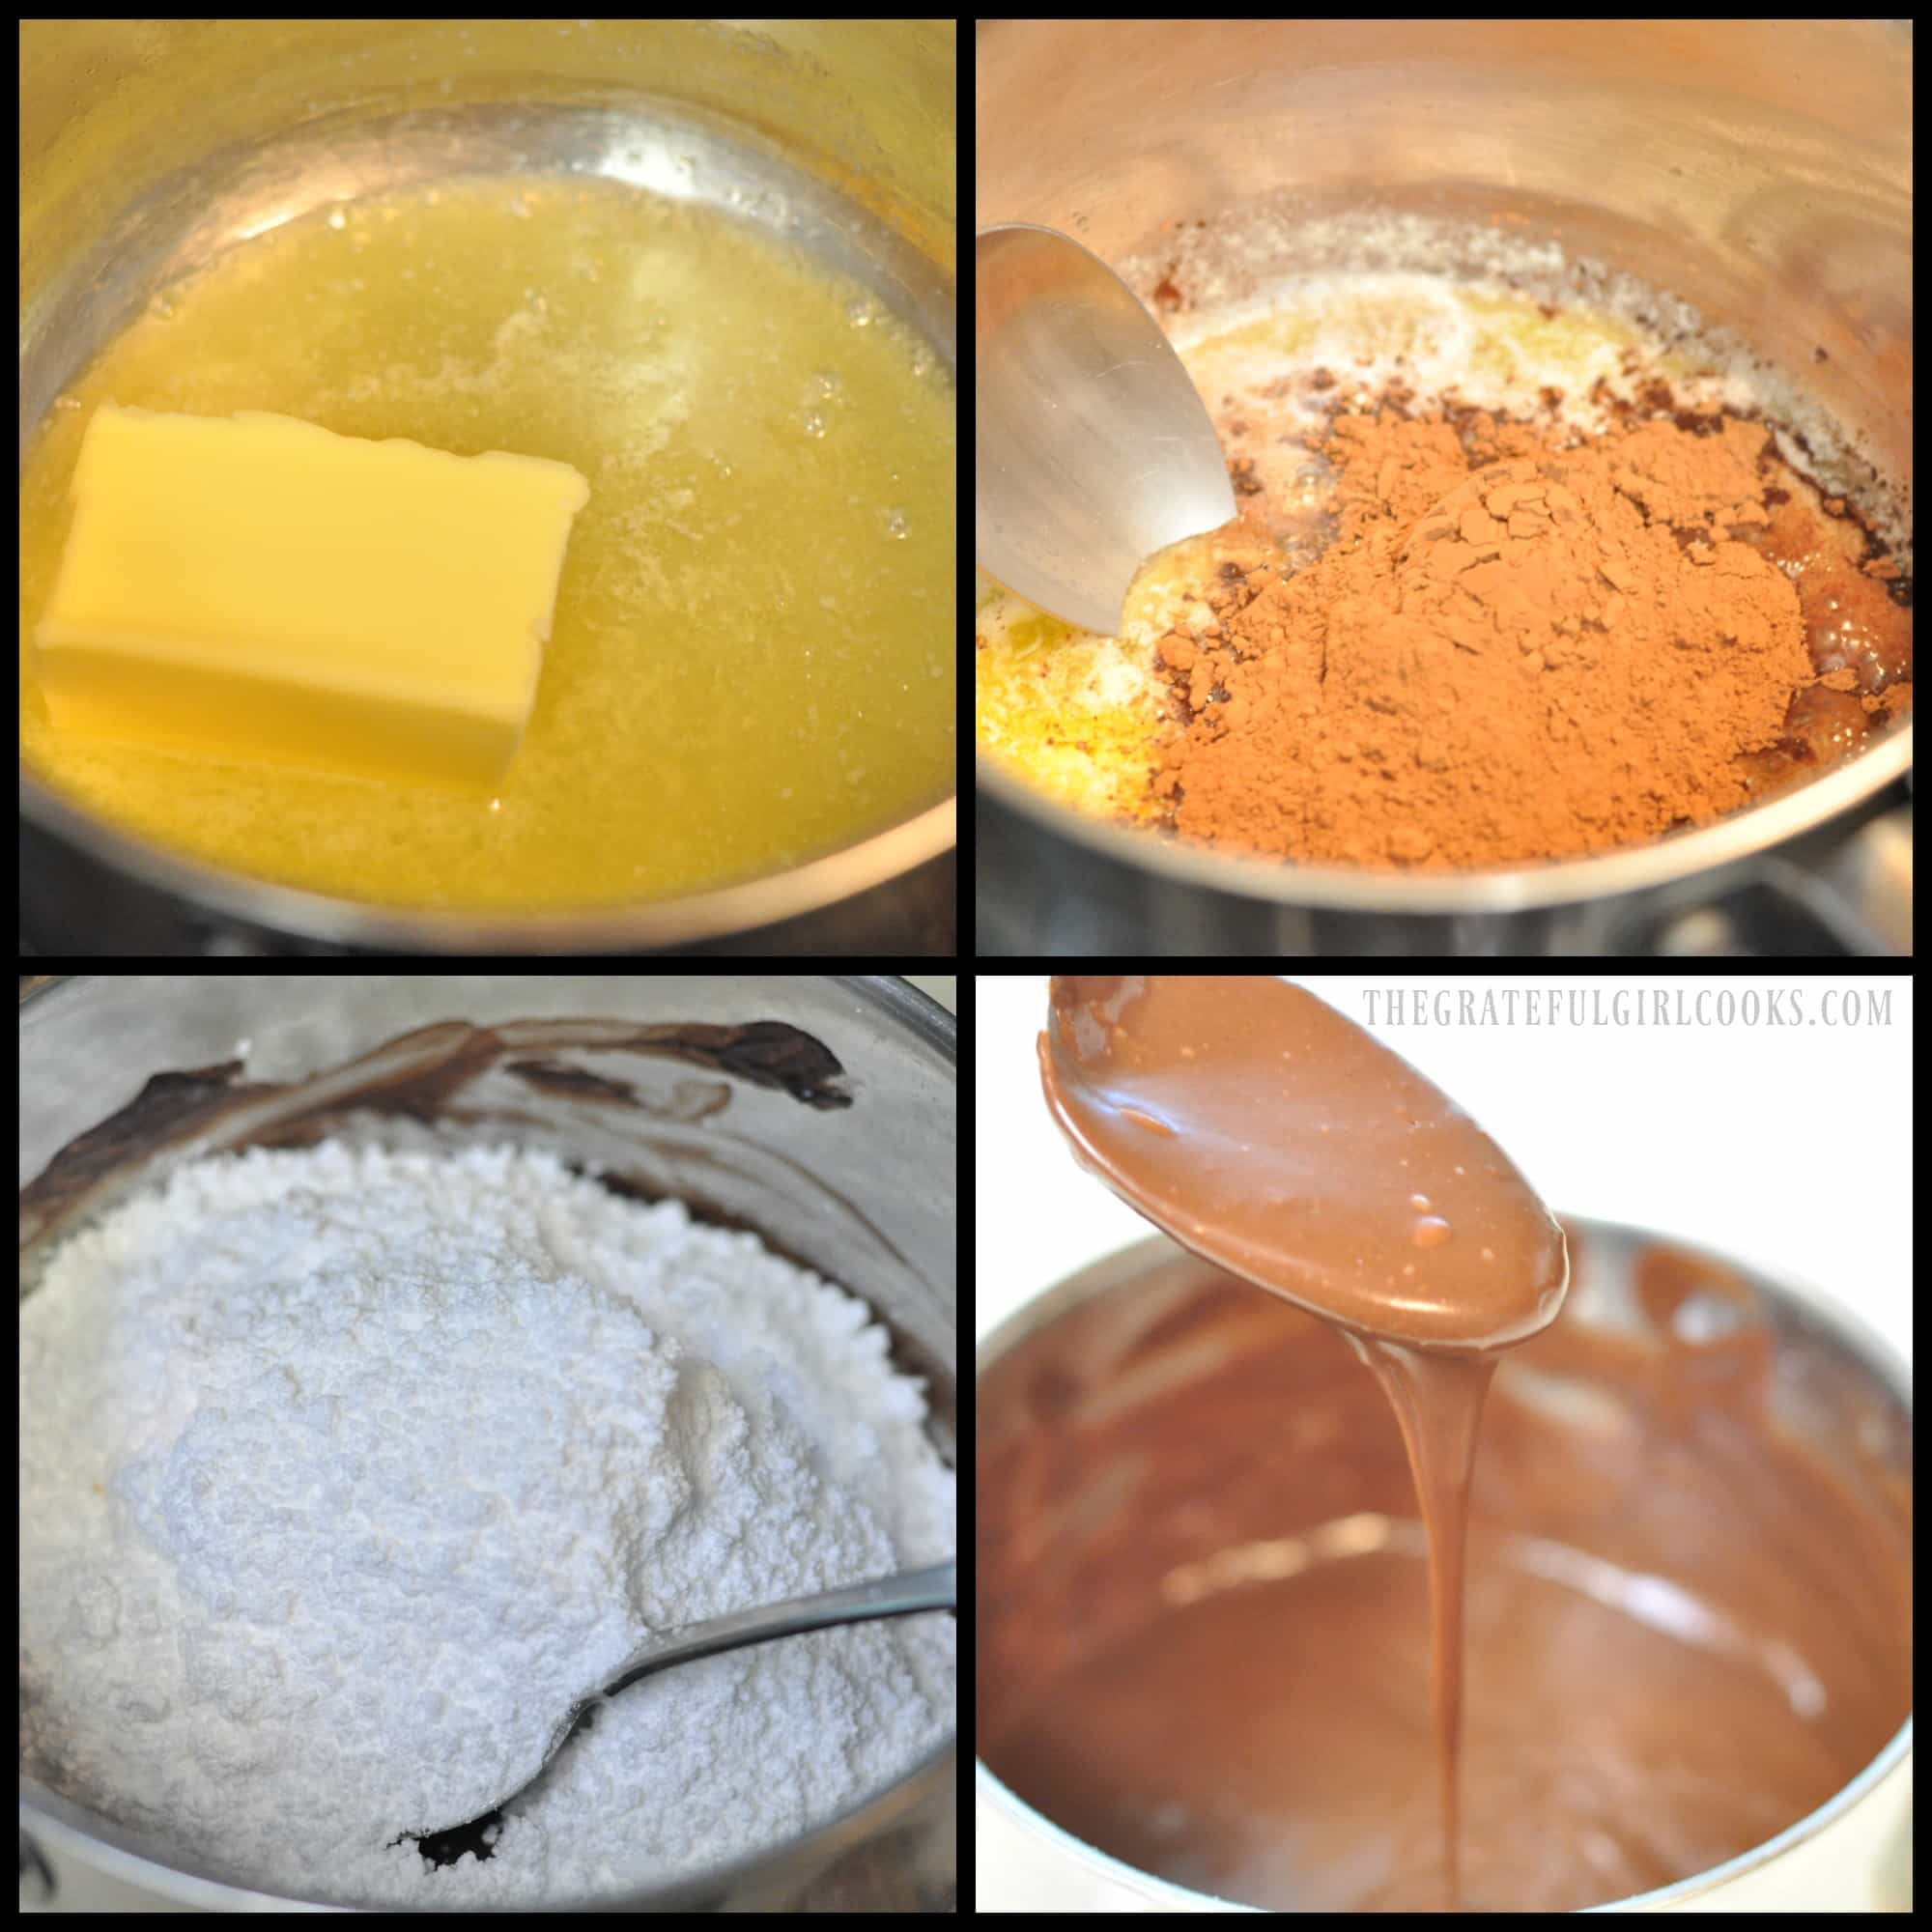 Mom's Easy Chocolate Cake / The Grateful Girl Cooks!